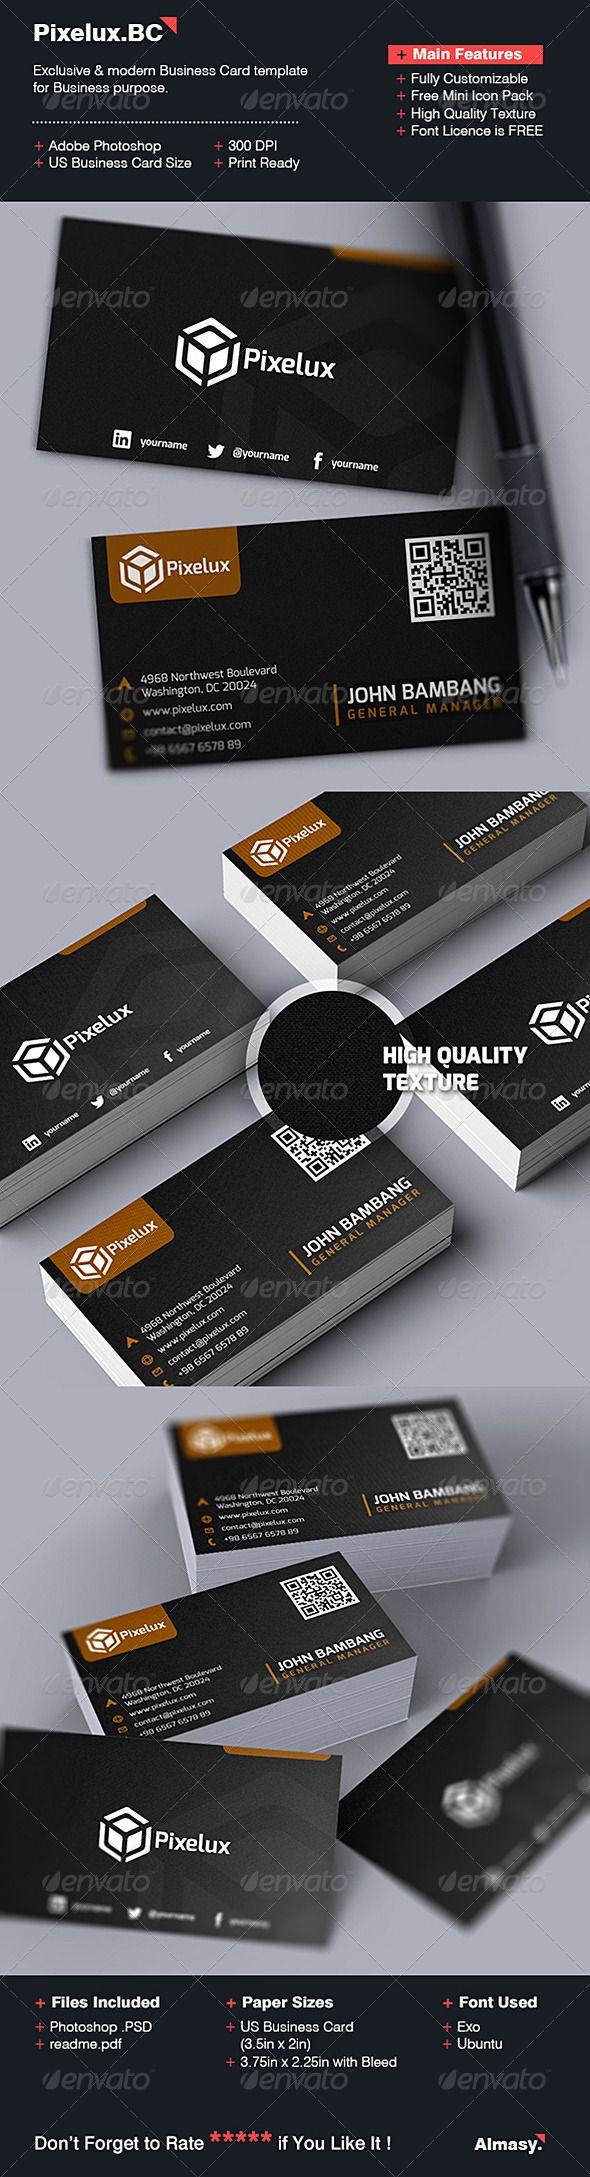 Simple business card 01 simple business cards business cards simple business card 01 simple business cards business cards and business fonts reheart Gallery